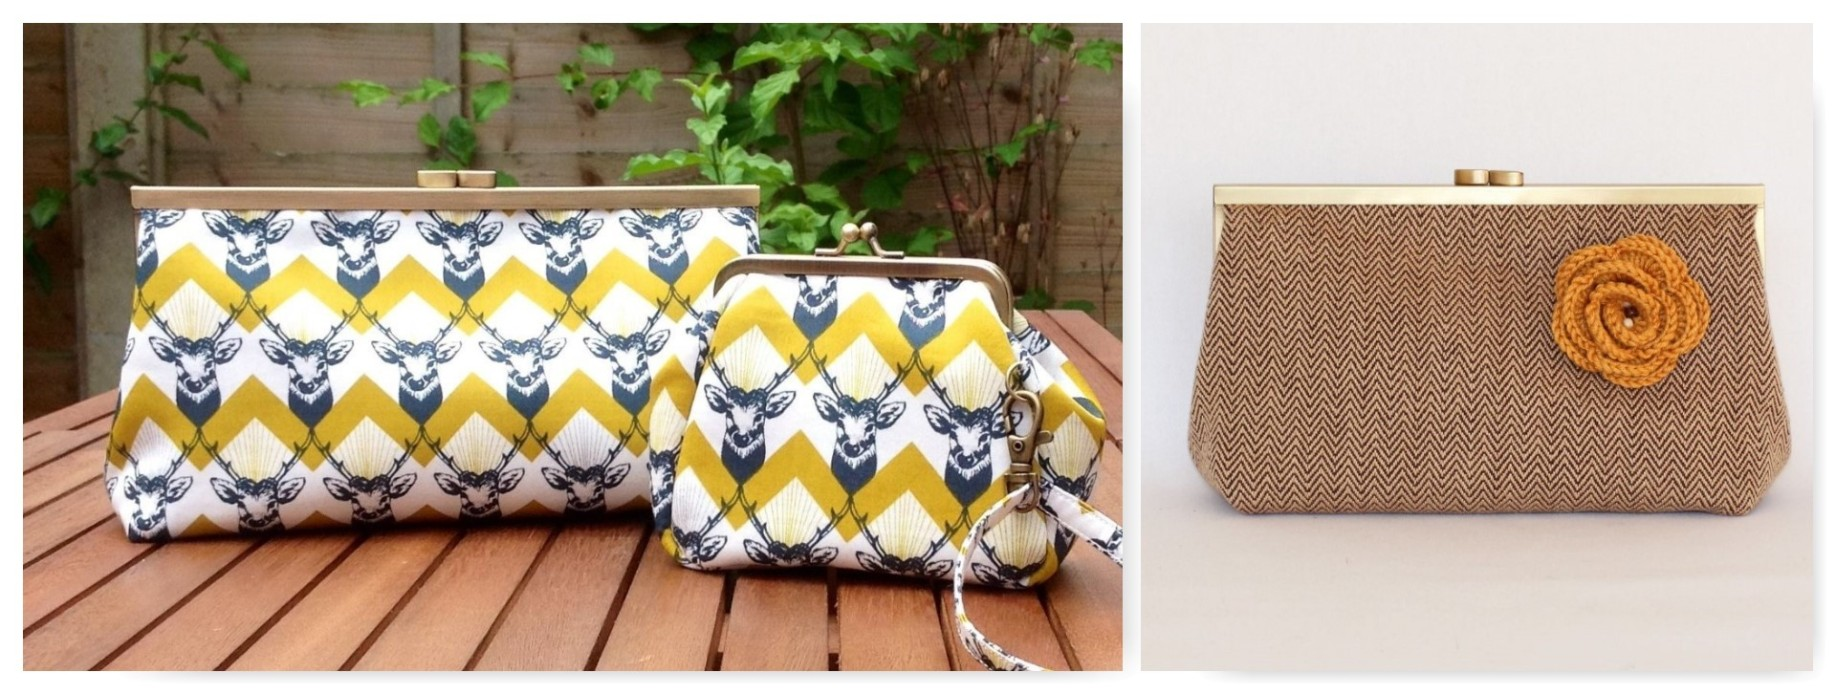 clasp purse collage